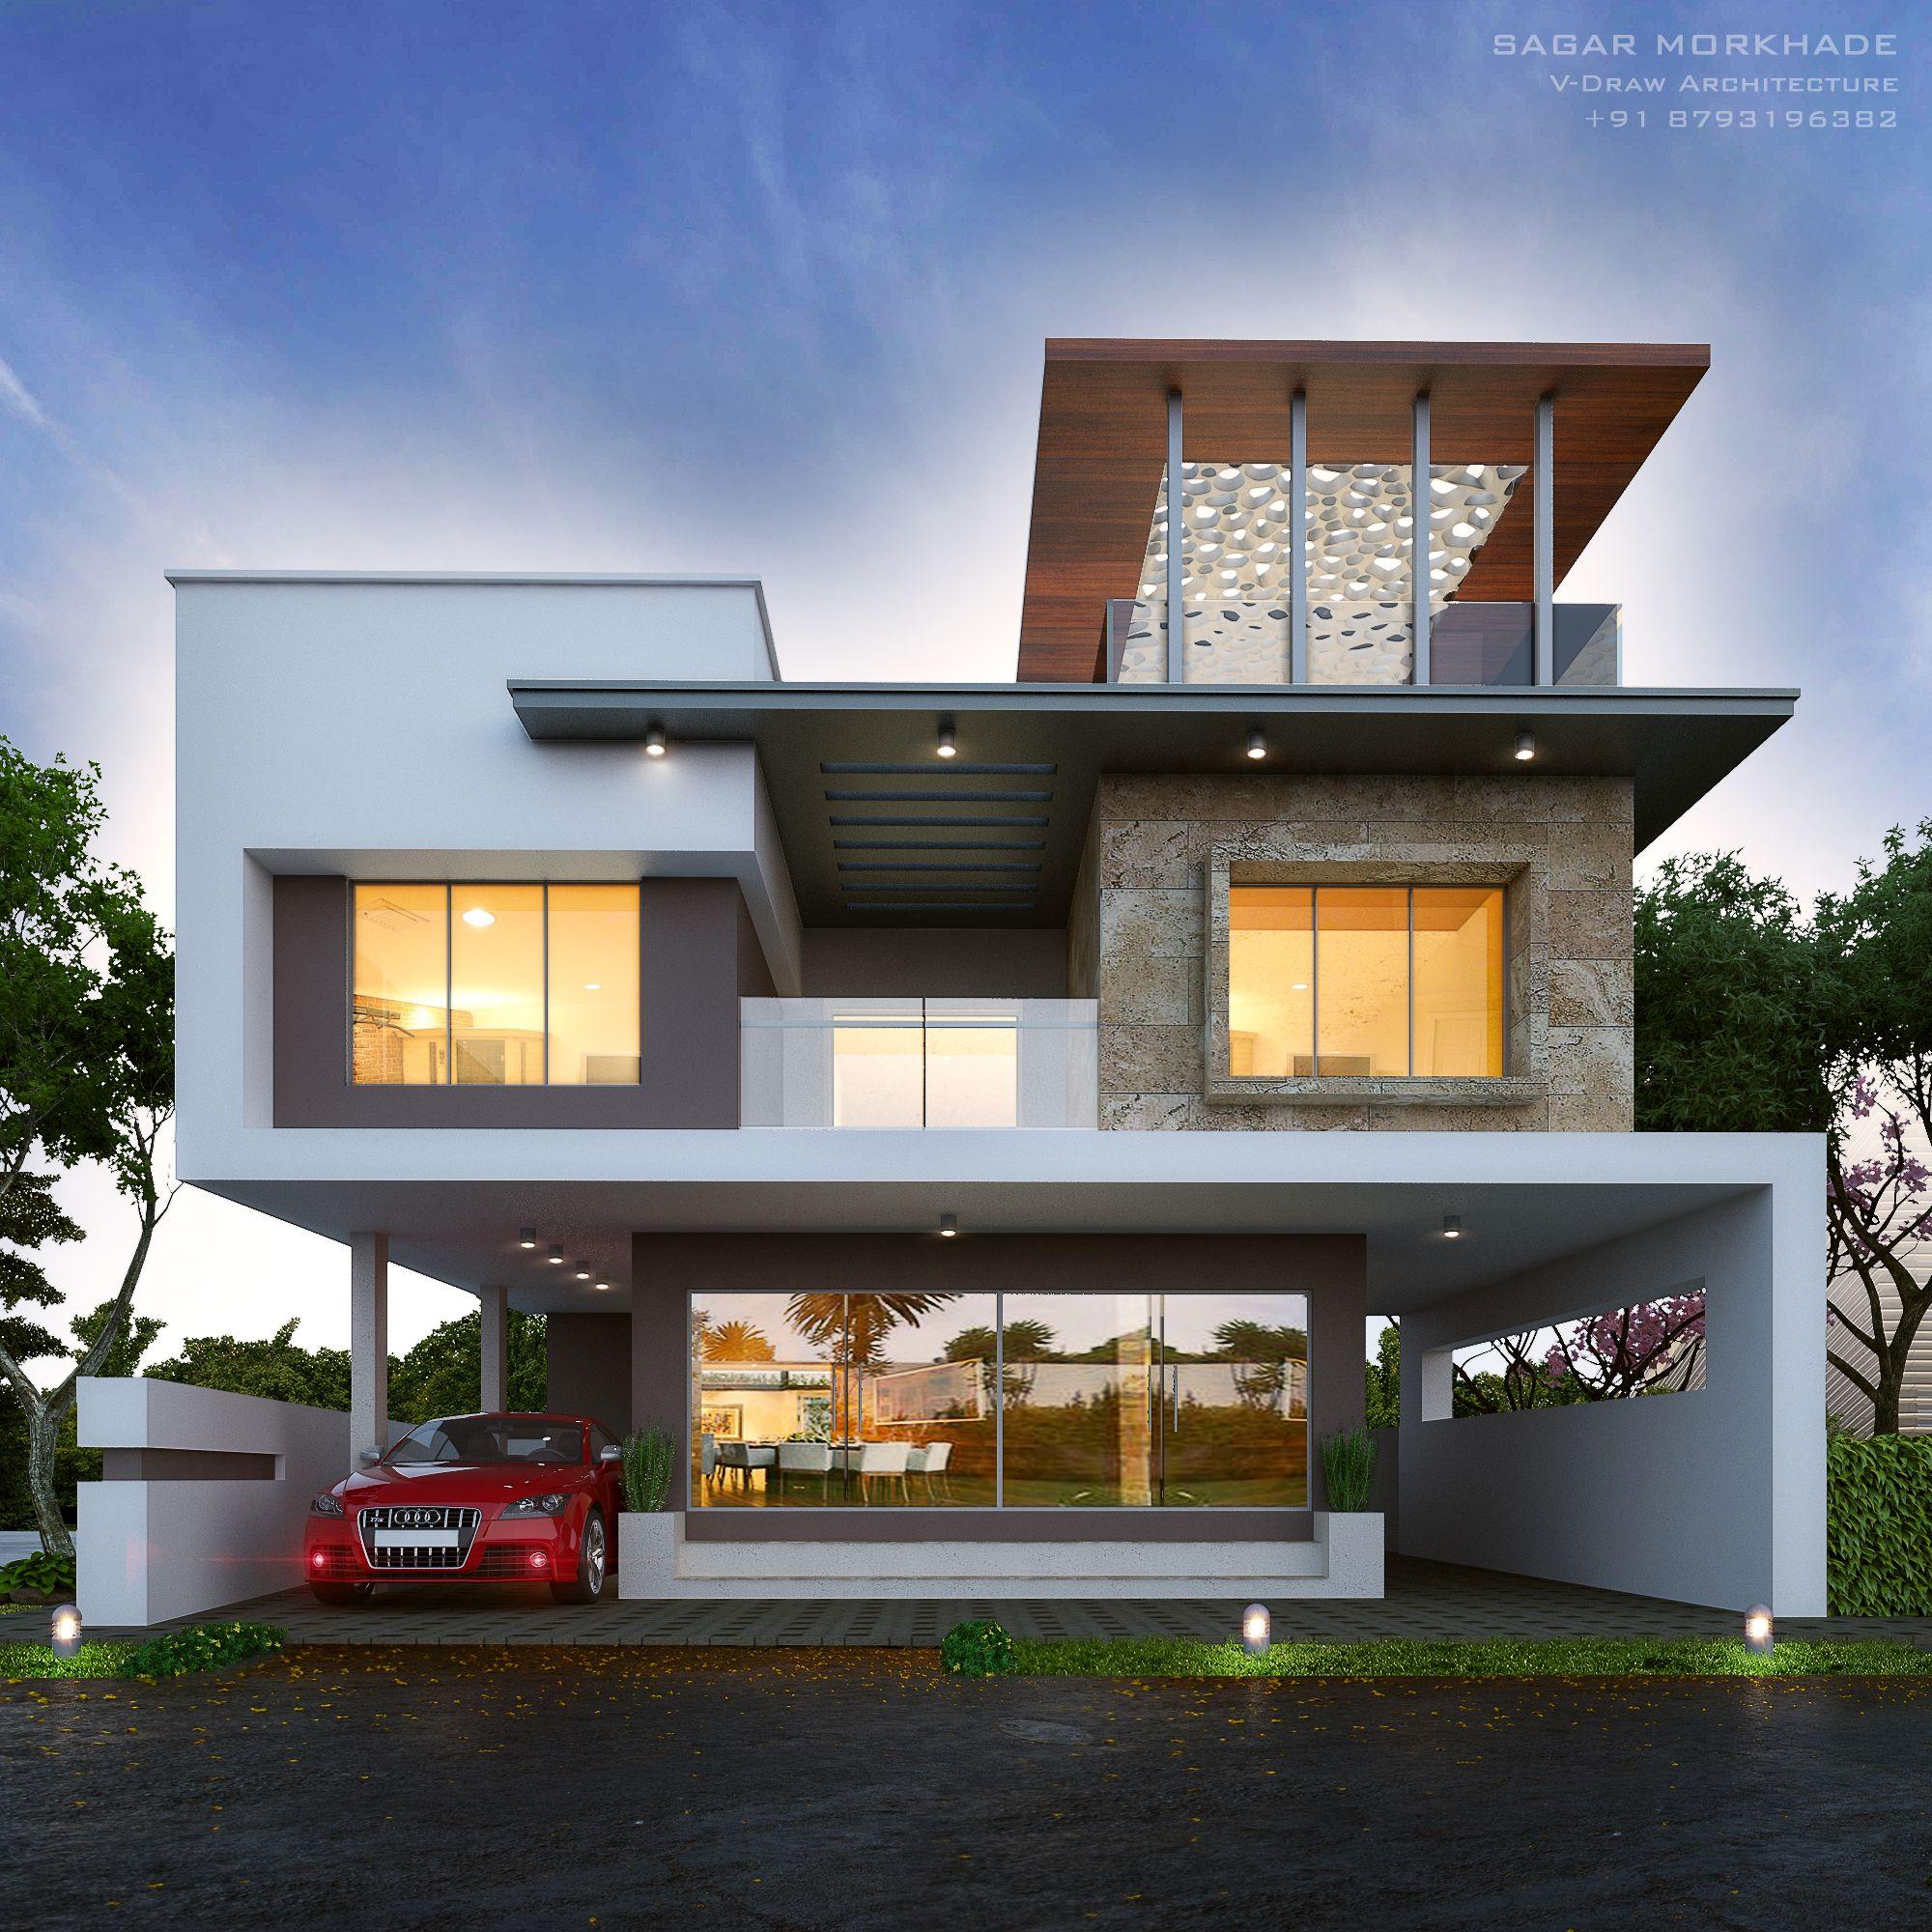 Modern Home Design Ideas Exterior:  Modern _ House _ Exterior _Elevation By: Sagar Morkhade (Vdraw